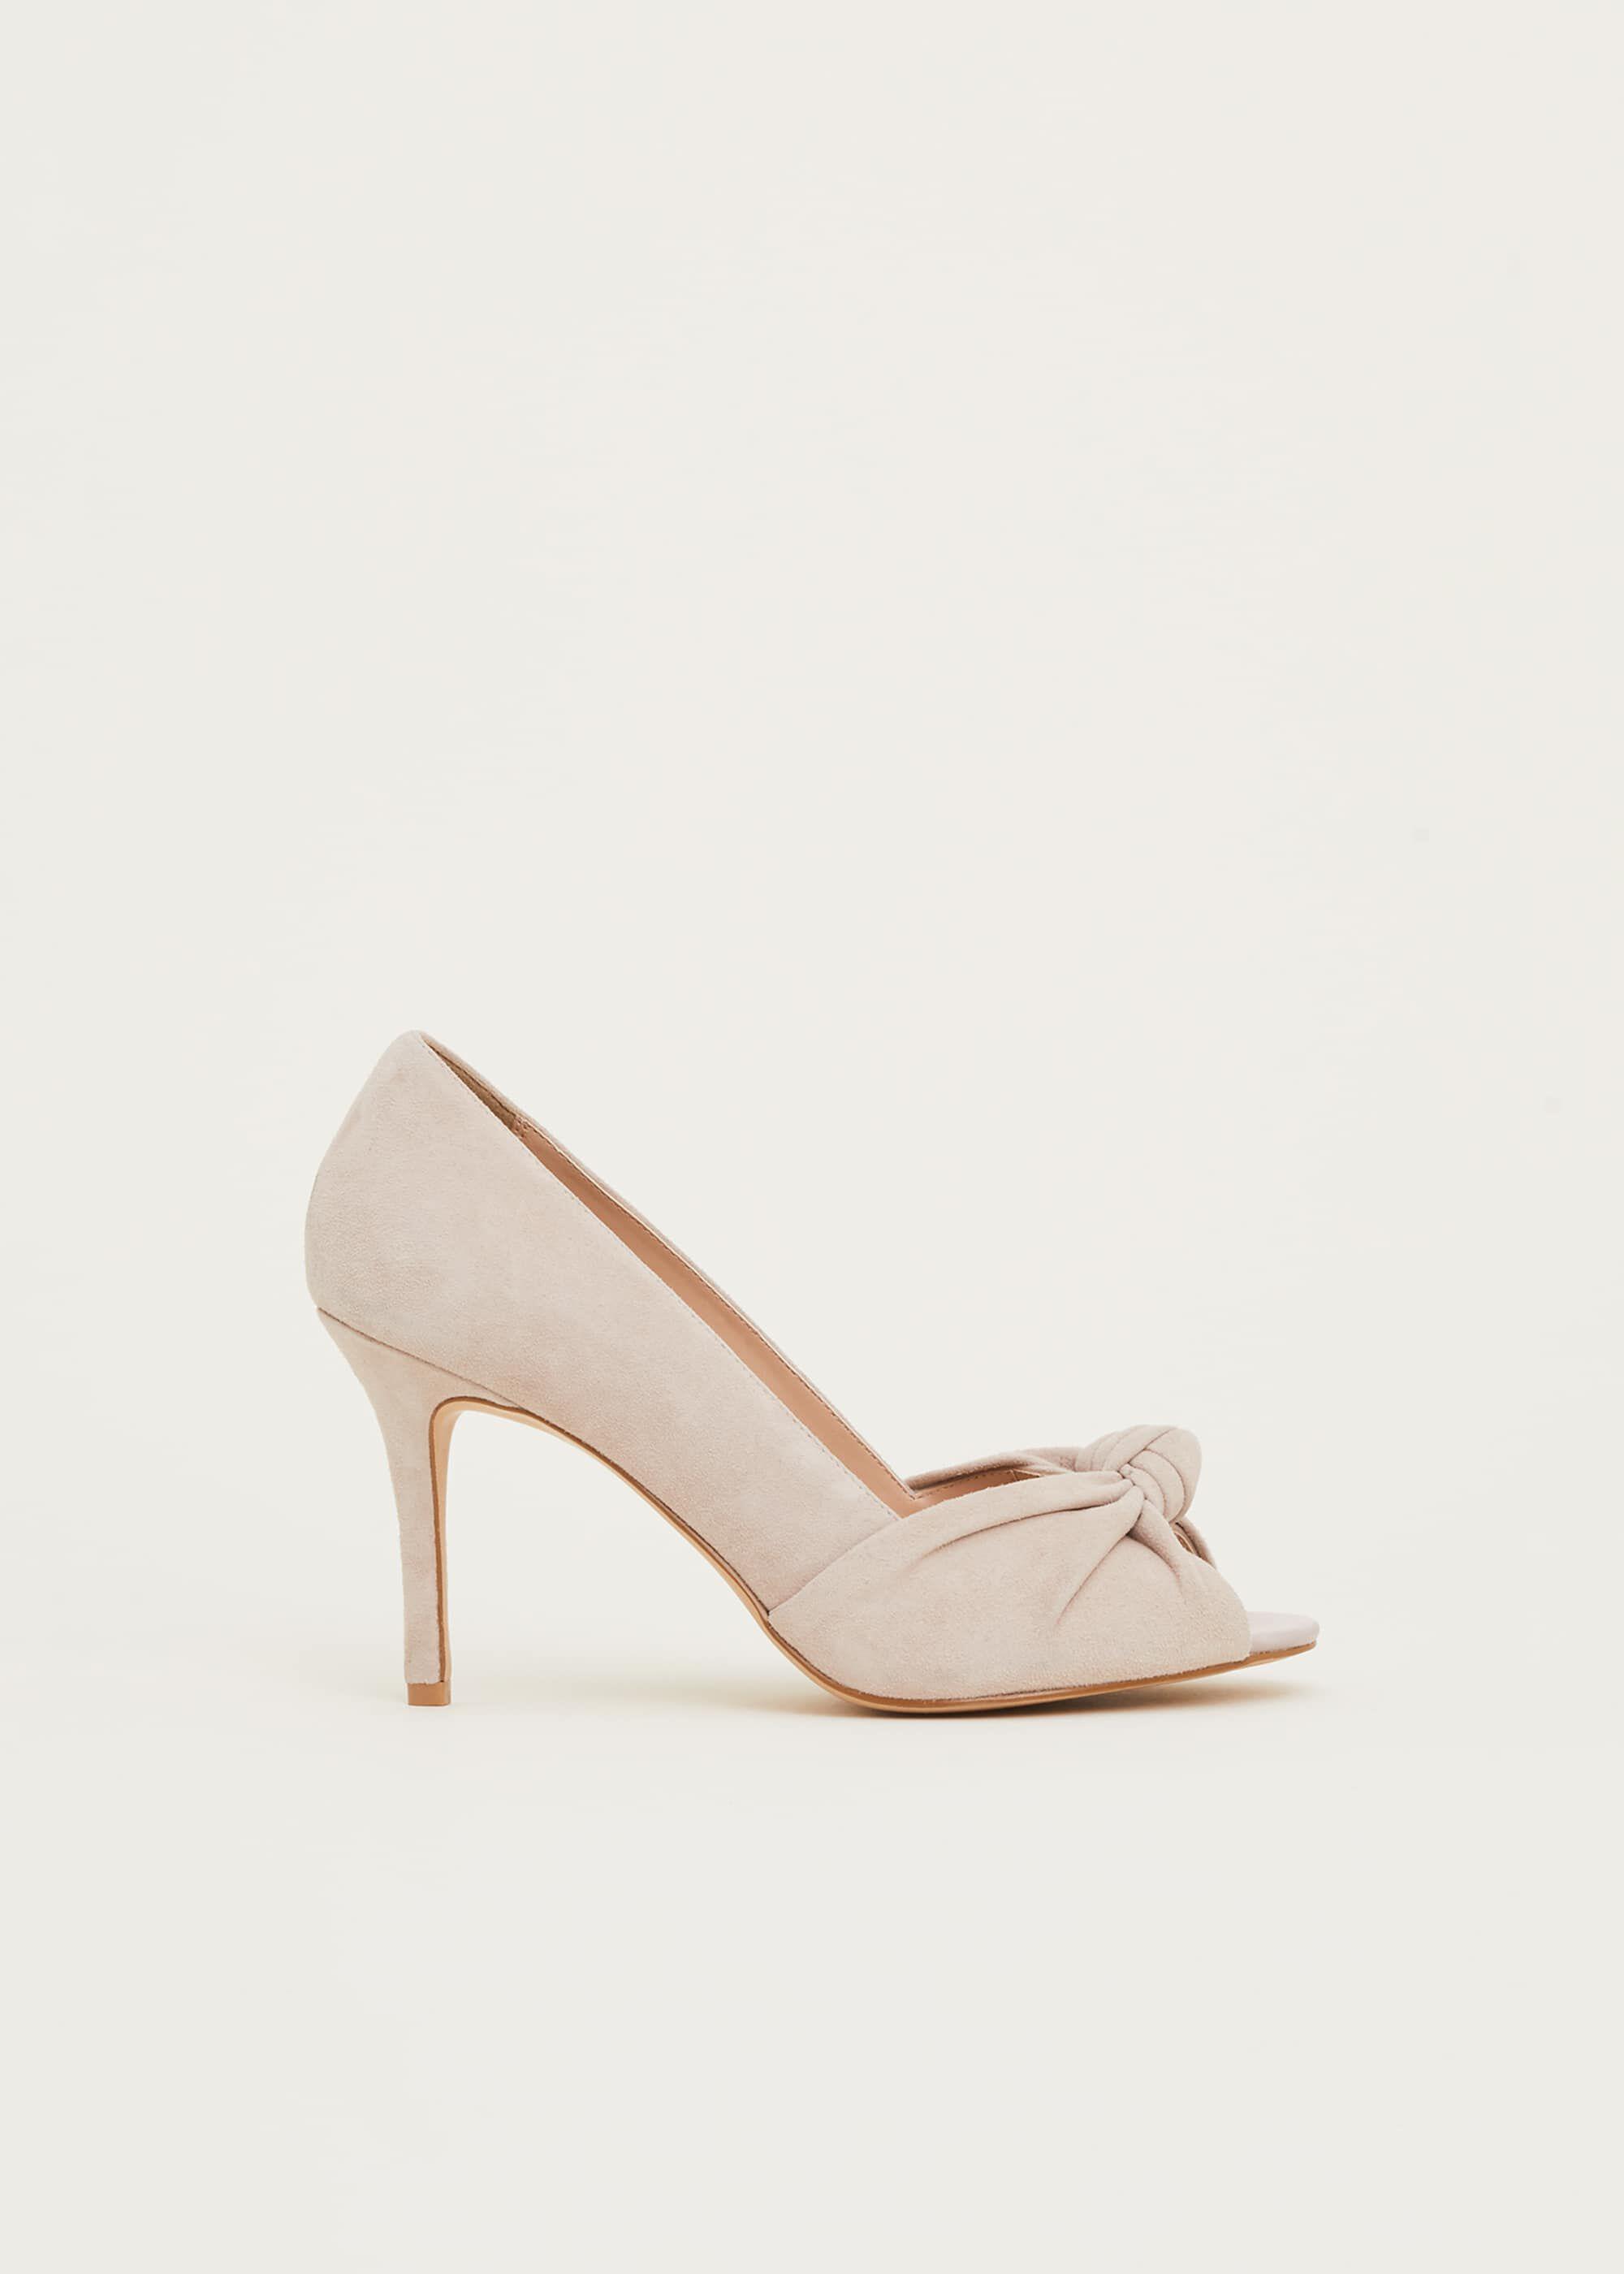 Sonja Suede Peep Toe Shoe | Phase Eight